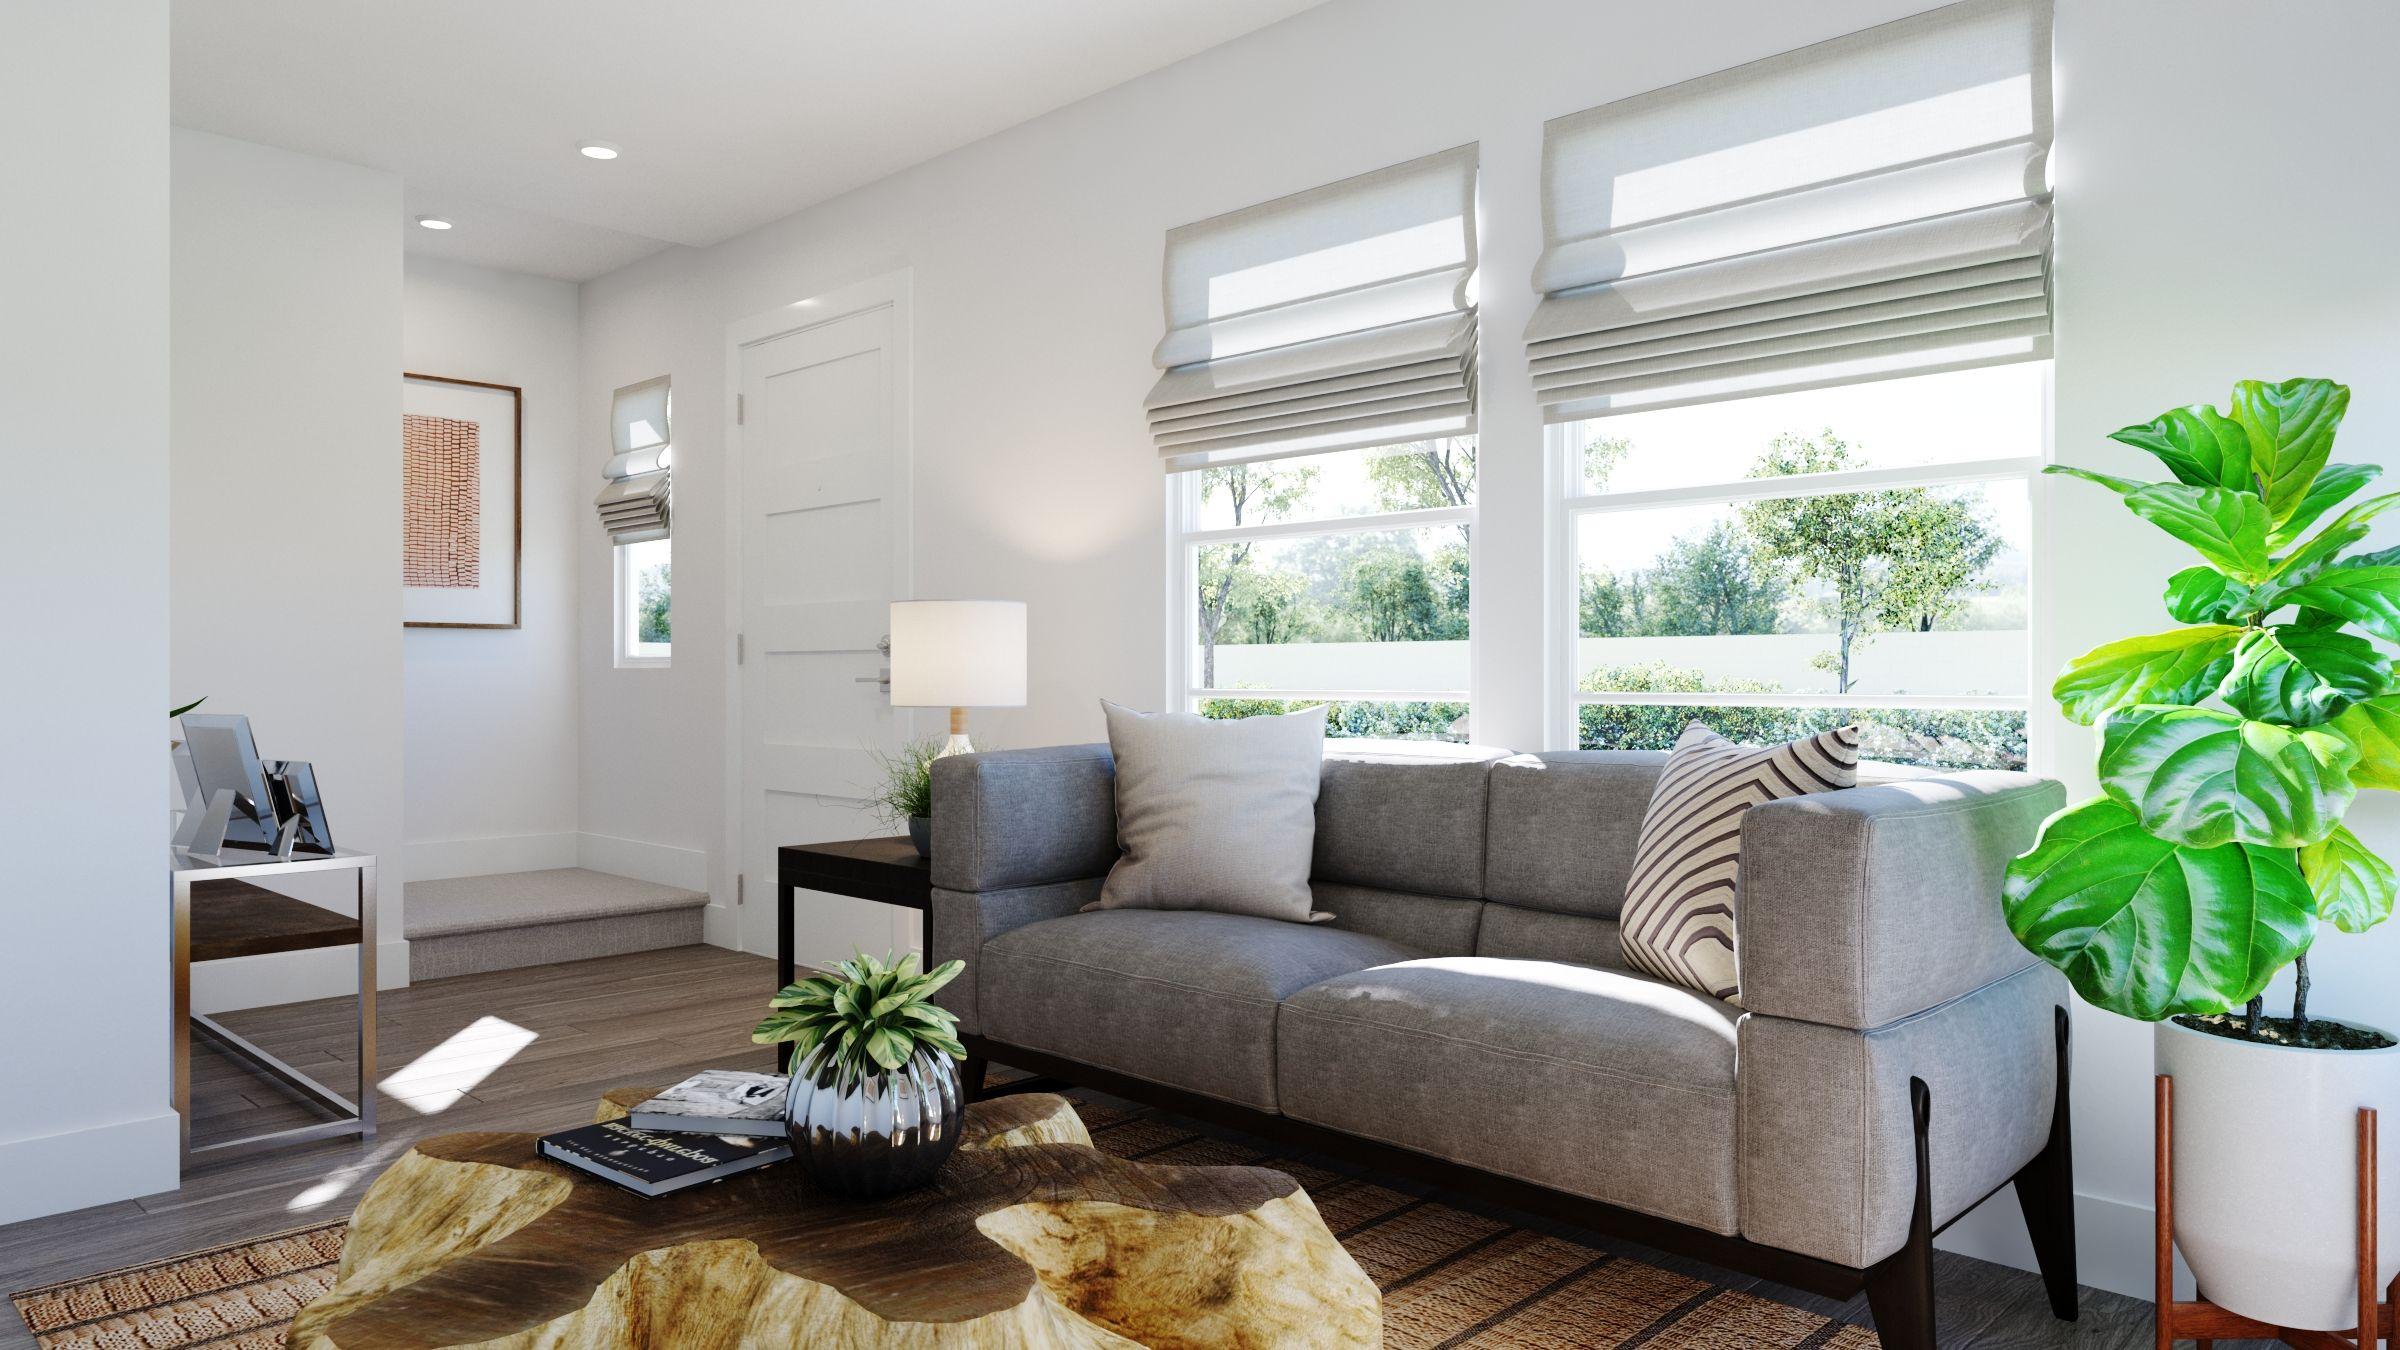 Living Area featured in the Volara Plan 2 By Bonanni Development in Orange County, CA